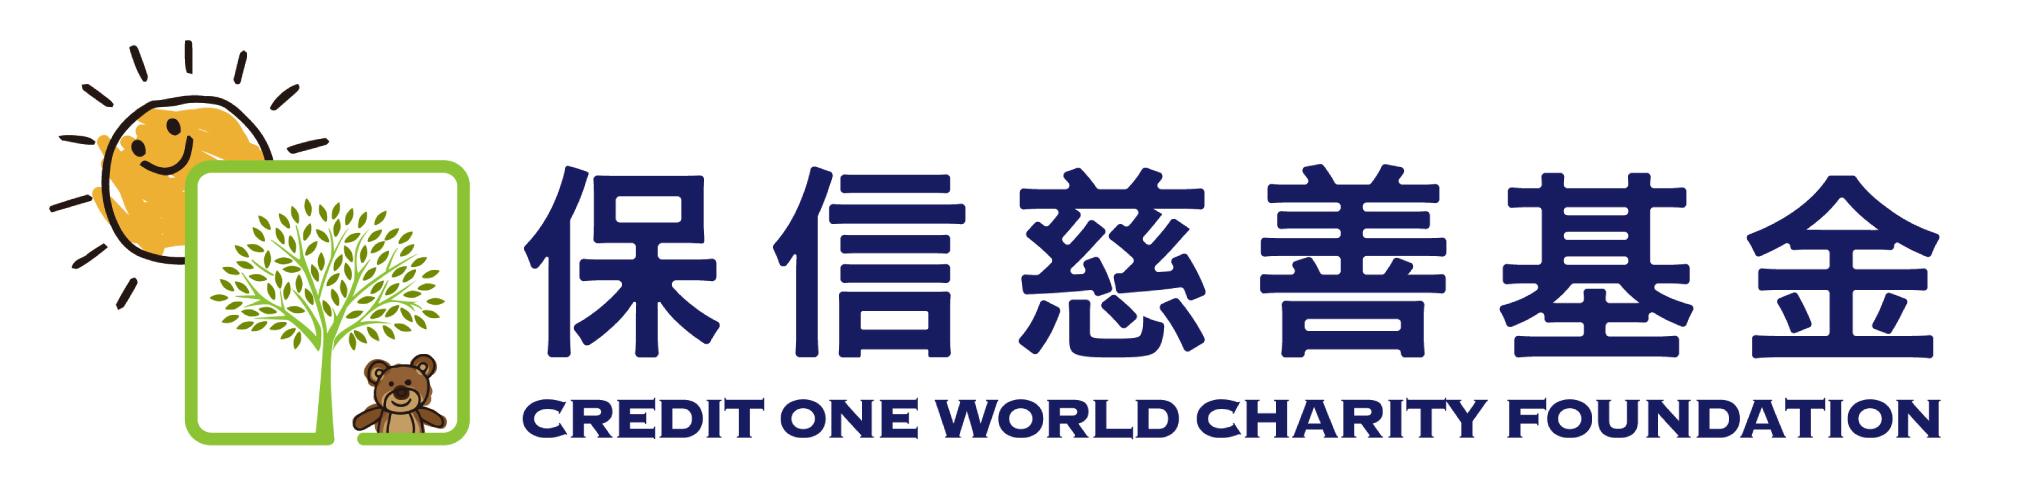 credit one wcf logo